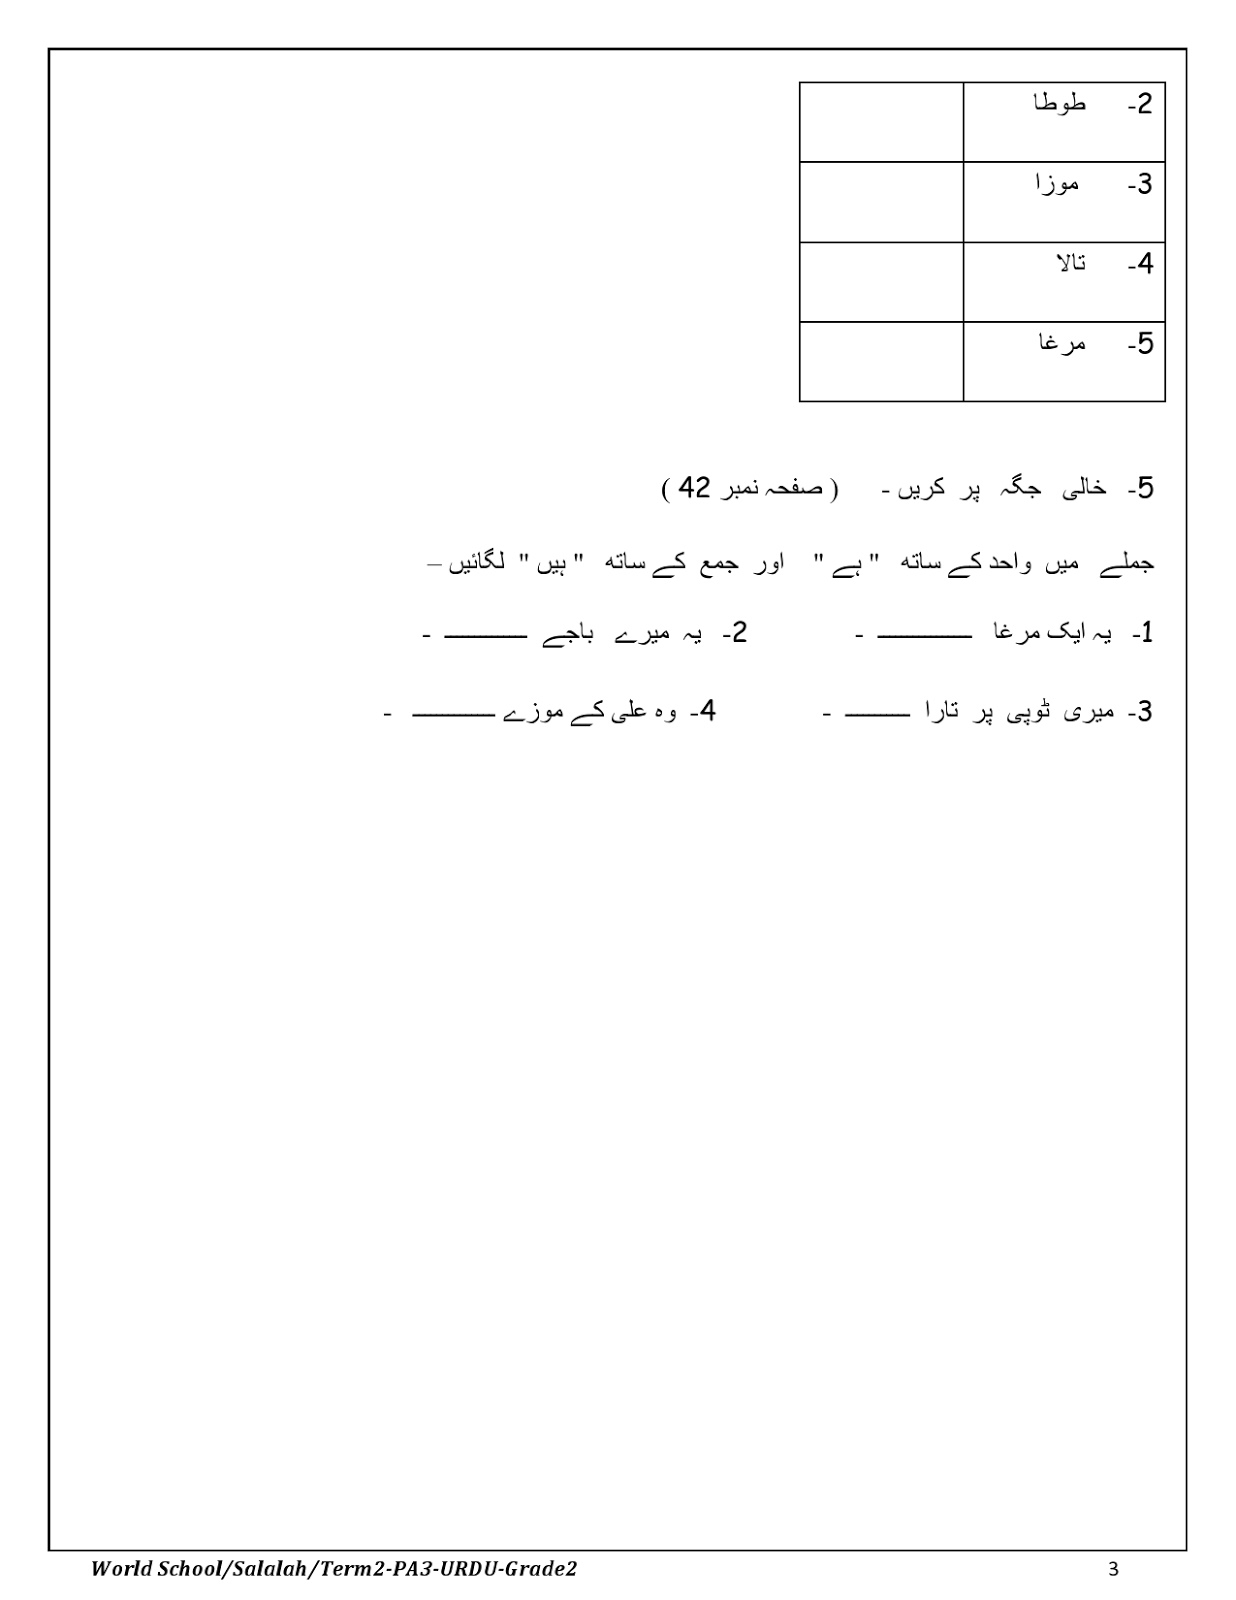 Birla World School Oman Homework For Grade 2 As On 13 03